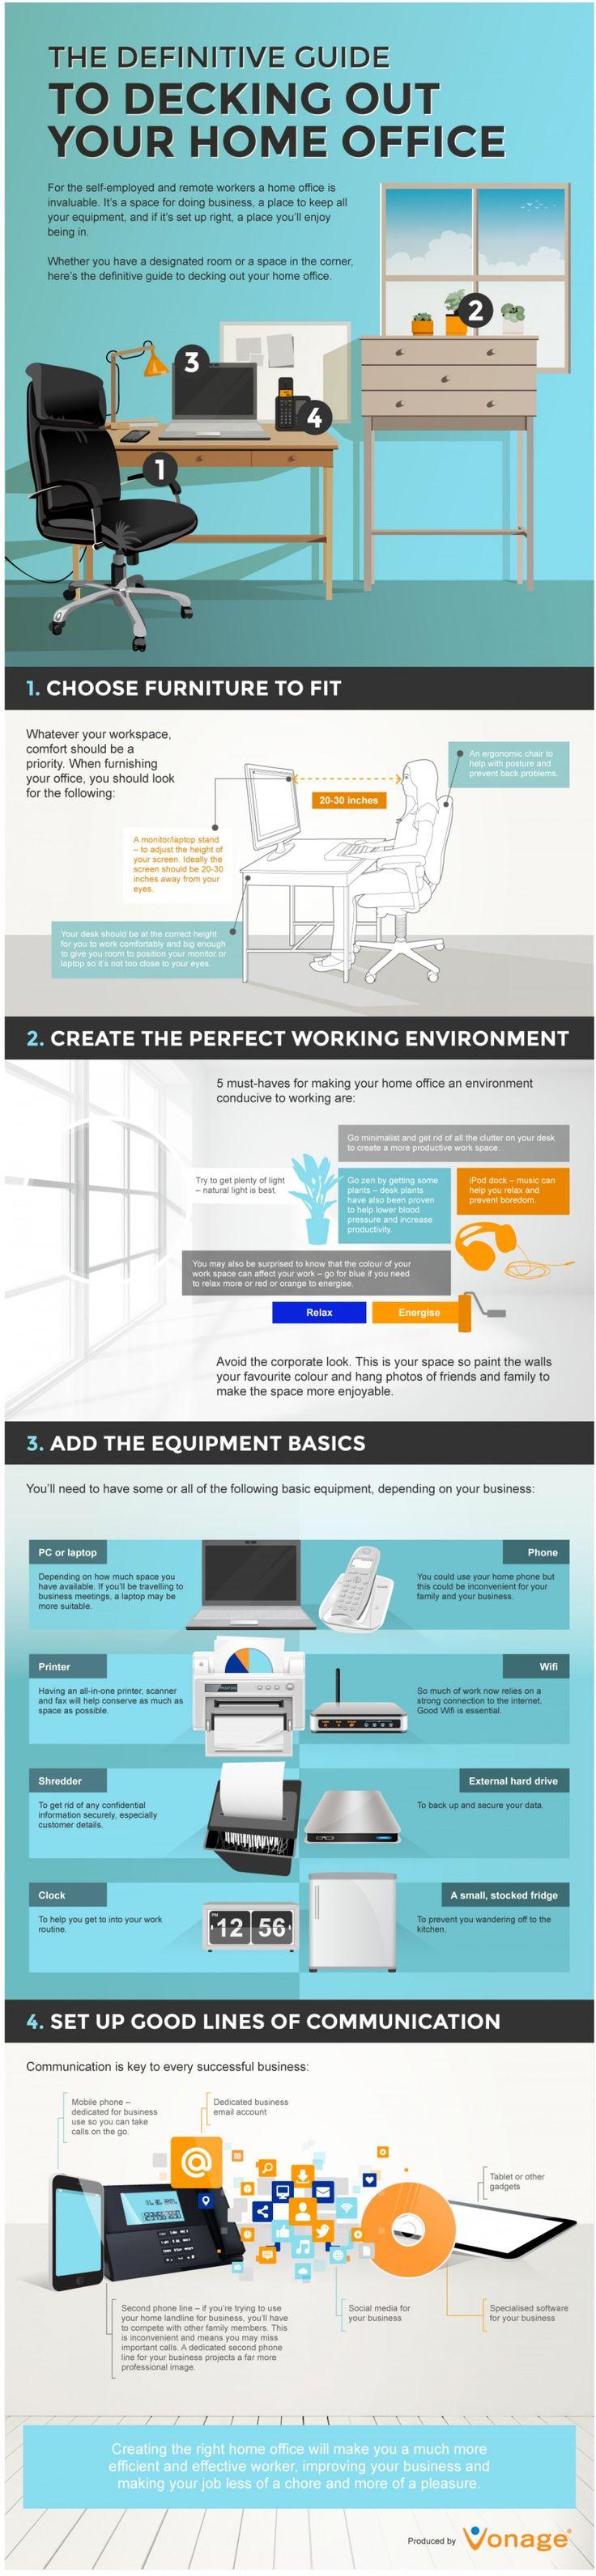 25 Best Ideas About Patio Set Up On Pinterest Patio